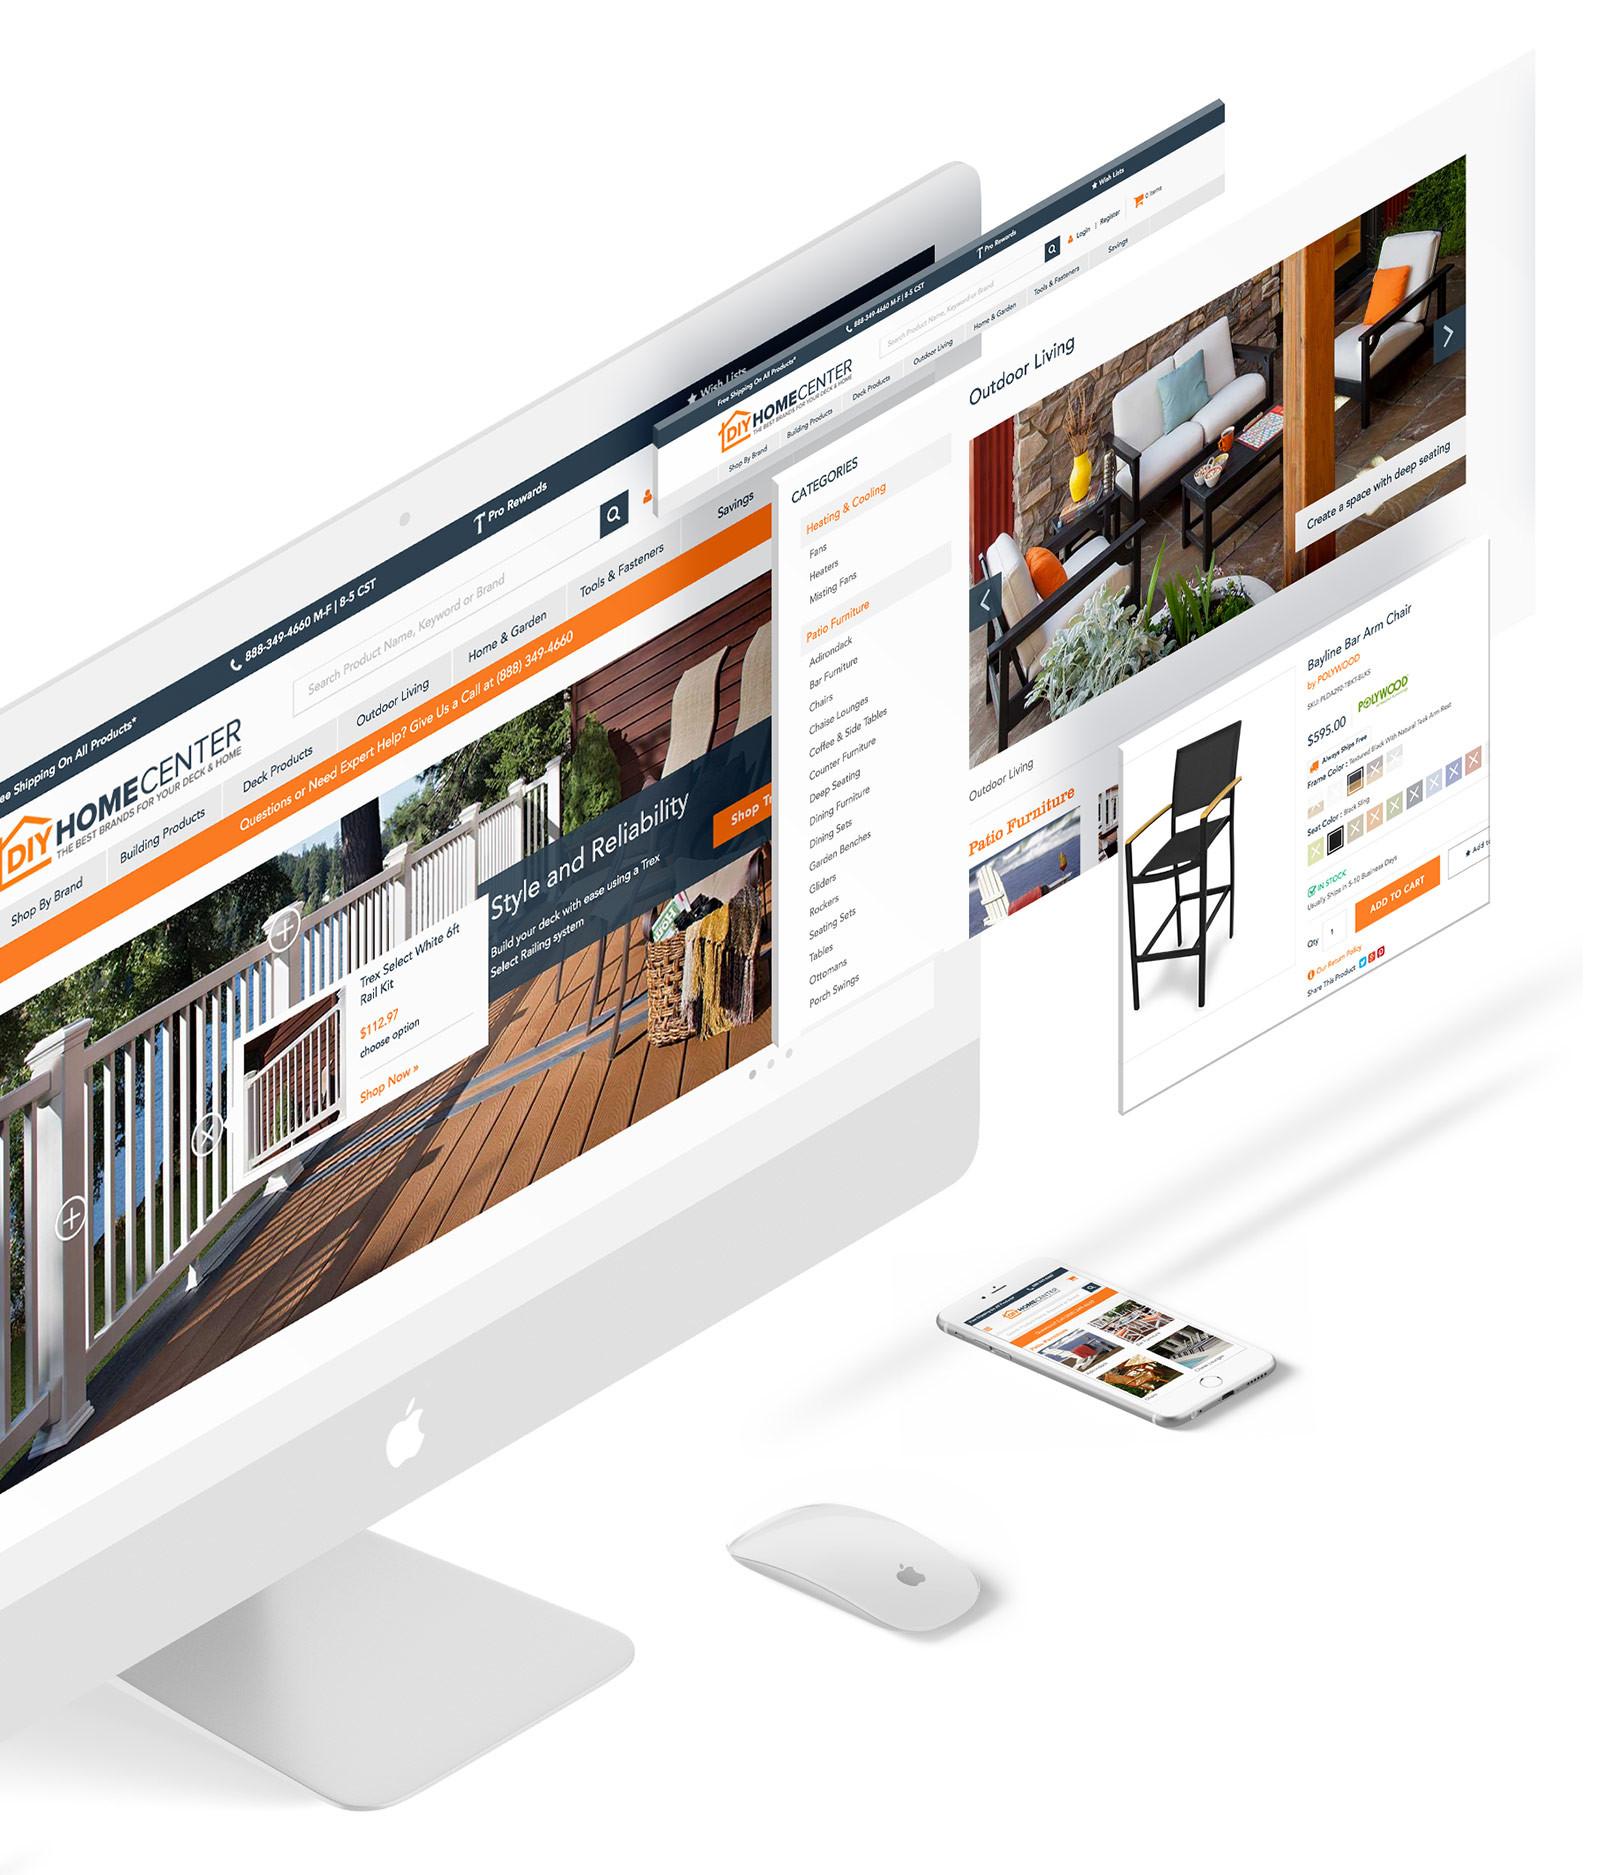 Best ideas about DIY Website Design . Save or Pin DIY Home Center – NetSuite Suite merce Web Design Now.